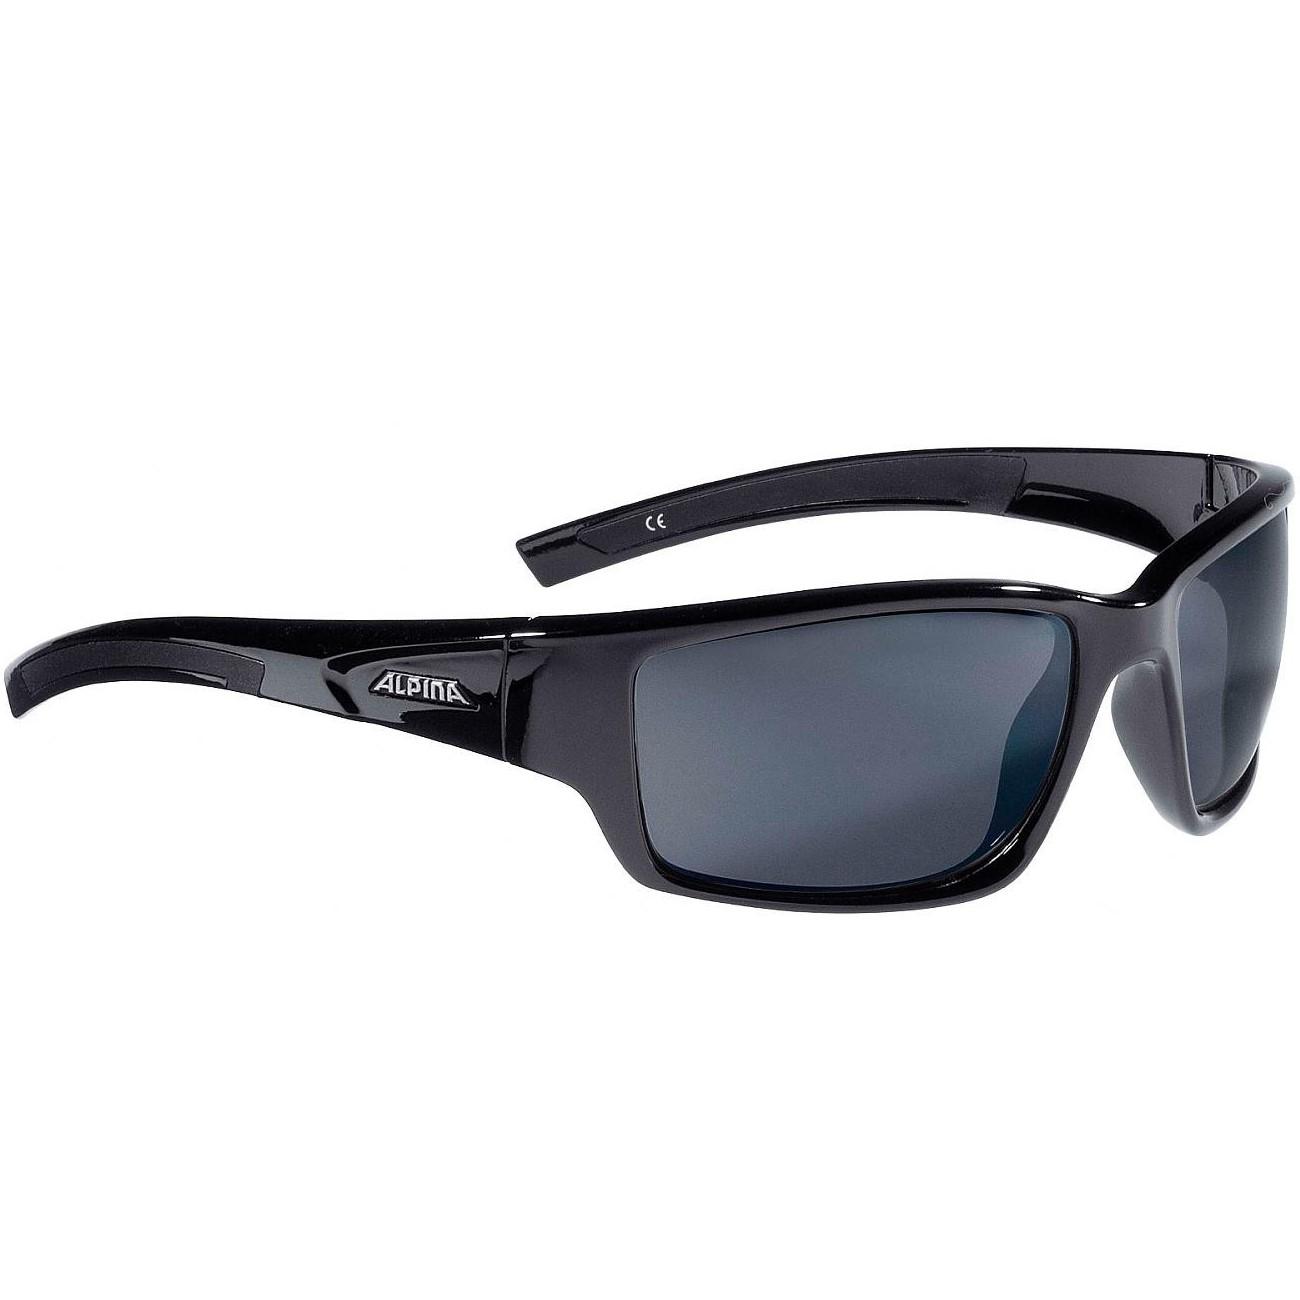 Alpina Keekor Sportbrille Grün J4d8uyc